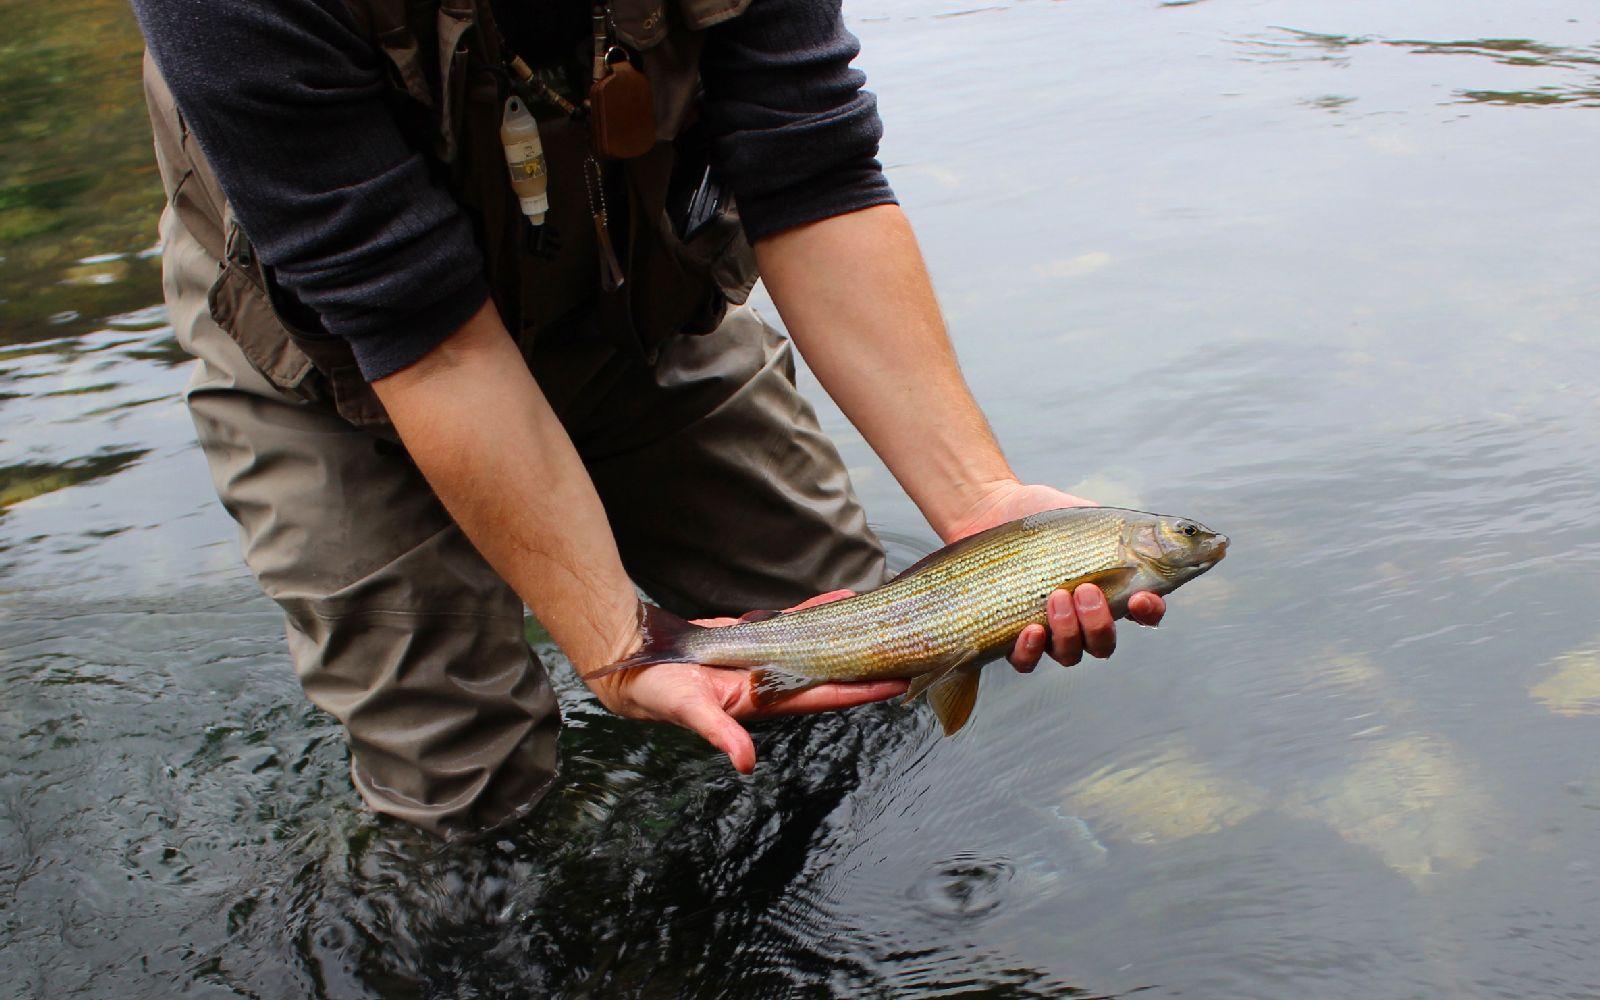 Ribolov na rijeci Uni